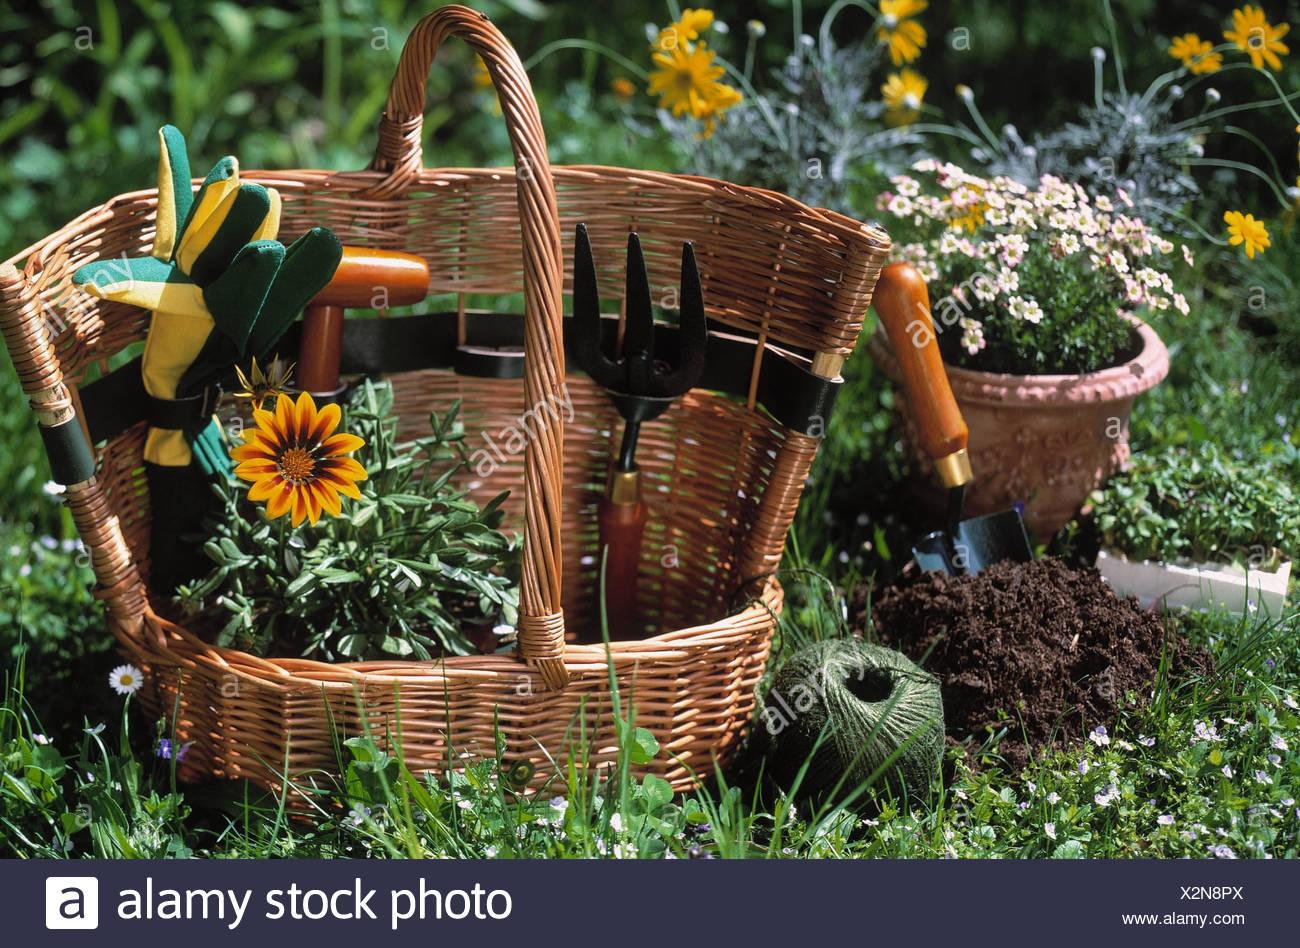 Garden, Detail, Flower Meadow, Wicker Basket, Garden Implements, Gardening  Tools, Garden Tennis Racket, Flower Branch, Dibble, Flowers, Working  Gloves, ...